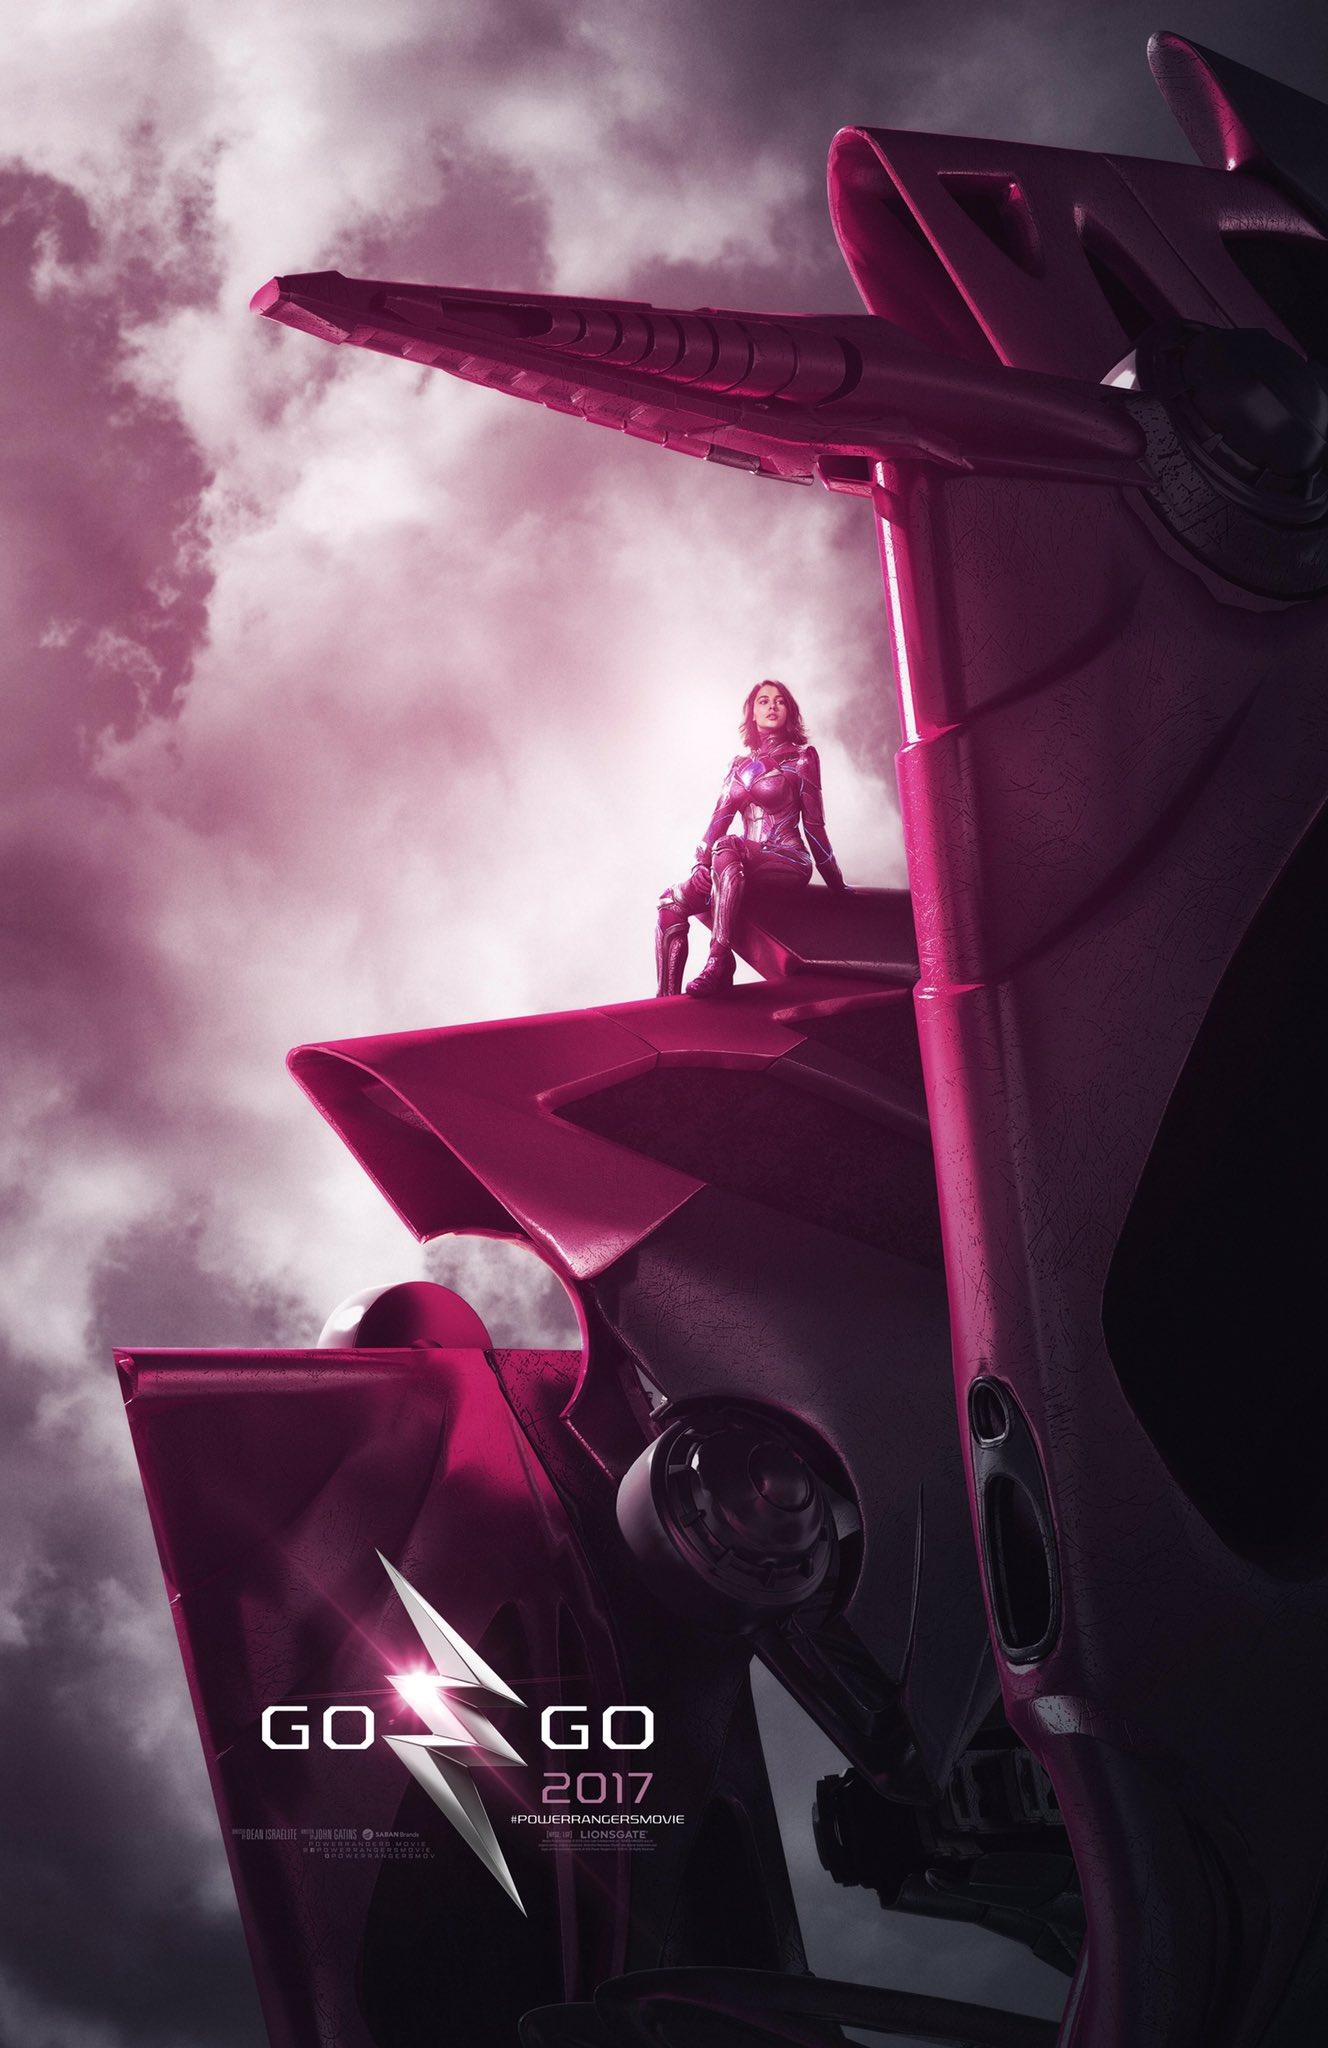 Промо-видео с NYCC-2016: John Wick: Chapter 2, Power Rangers, The Great Wall и Ninjak VS. The Valiant Universe 11